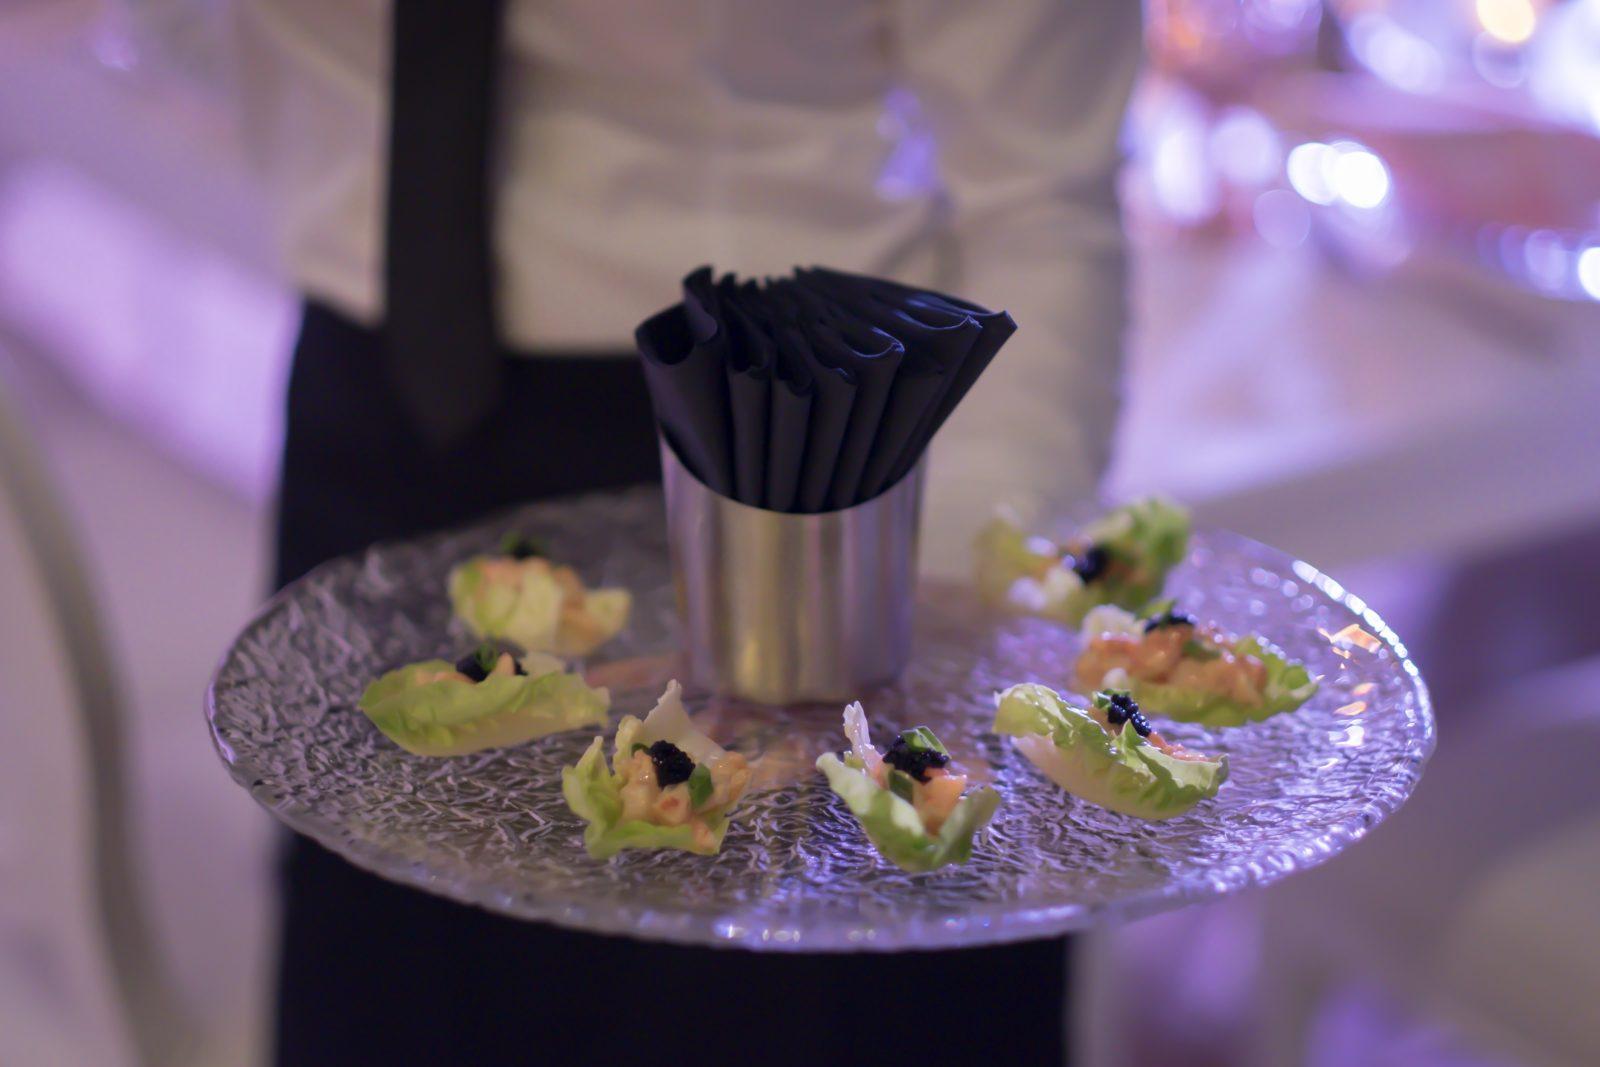 Canapés served on a glass tray